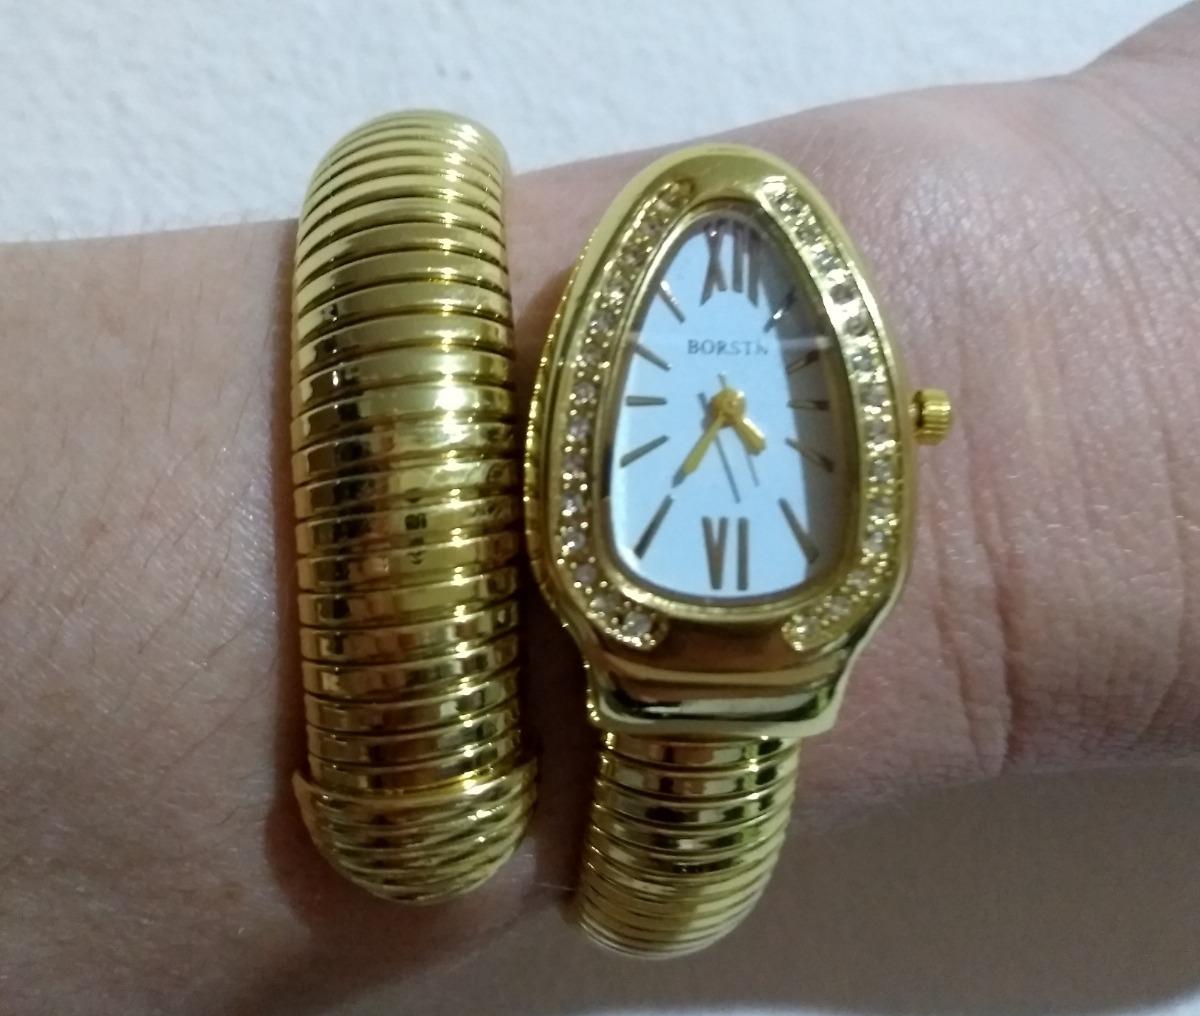 5e5fb59b304 Relógio Pulso Feminino Serpente Cobra Branco Dourado Borstn - R  149 ...